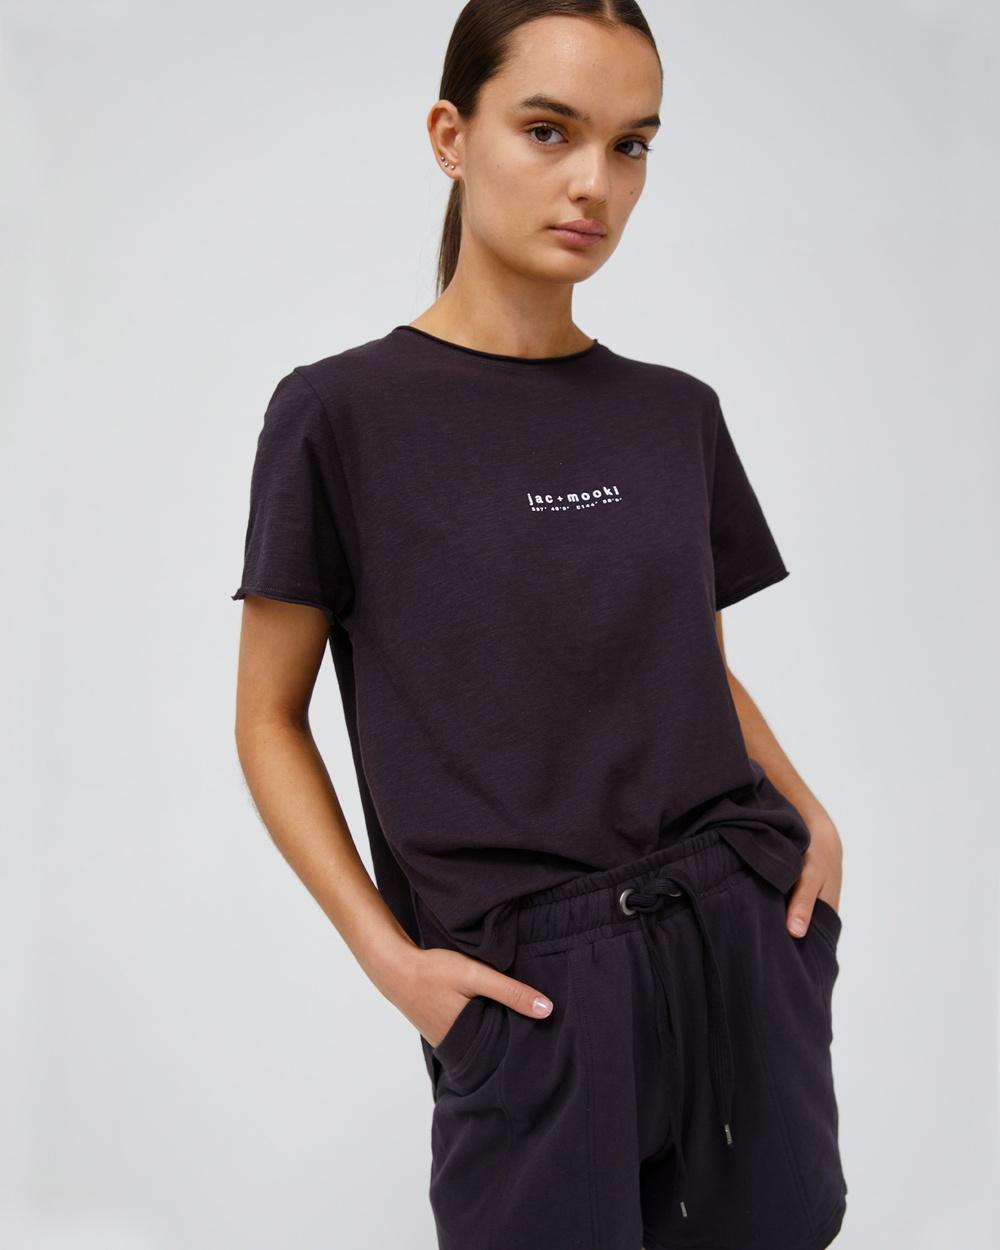 Jac & Mooki Kendall Tee T-Shirts Singlets vintage black